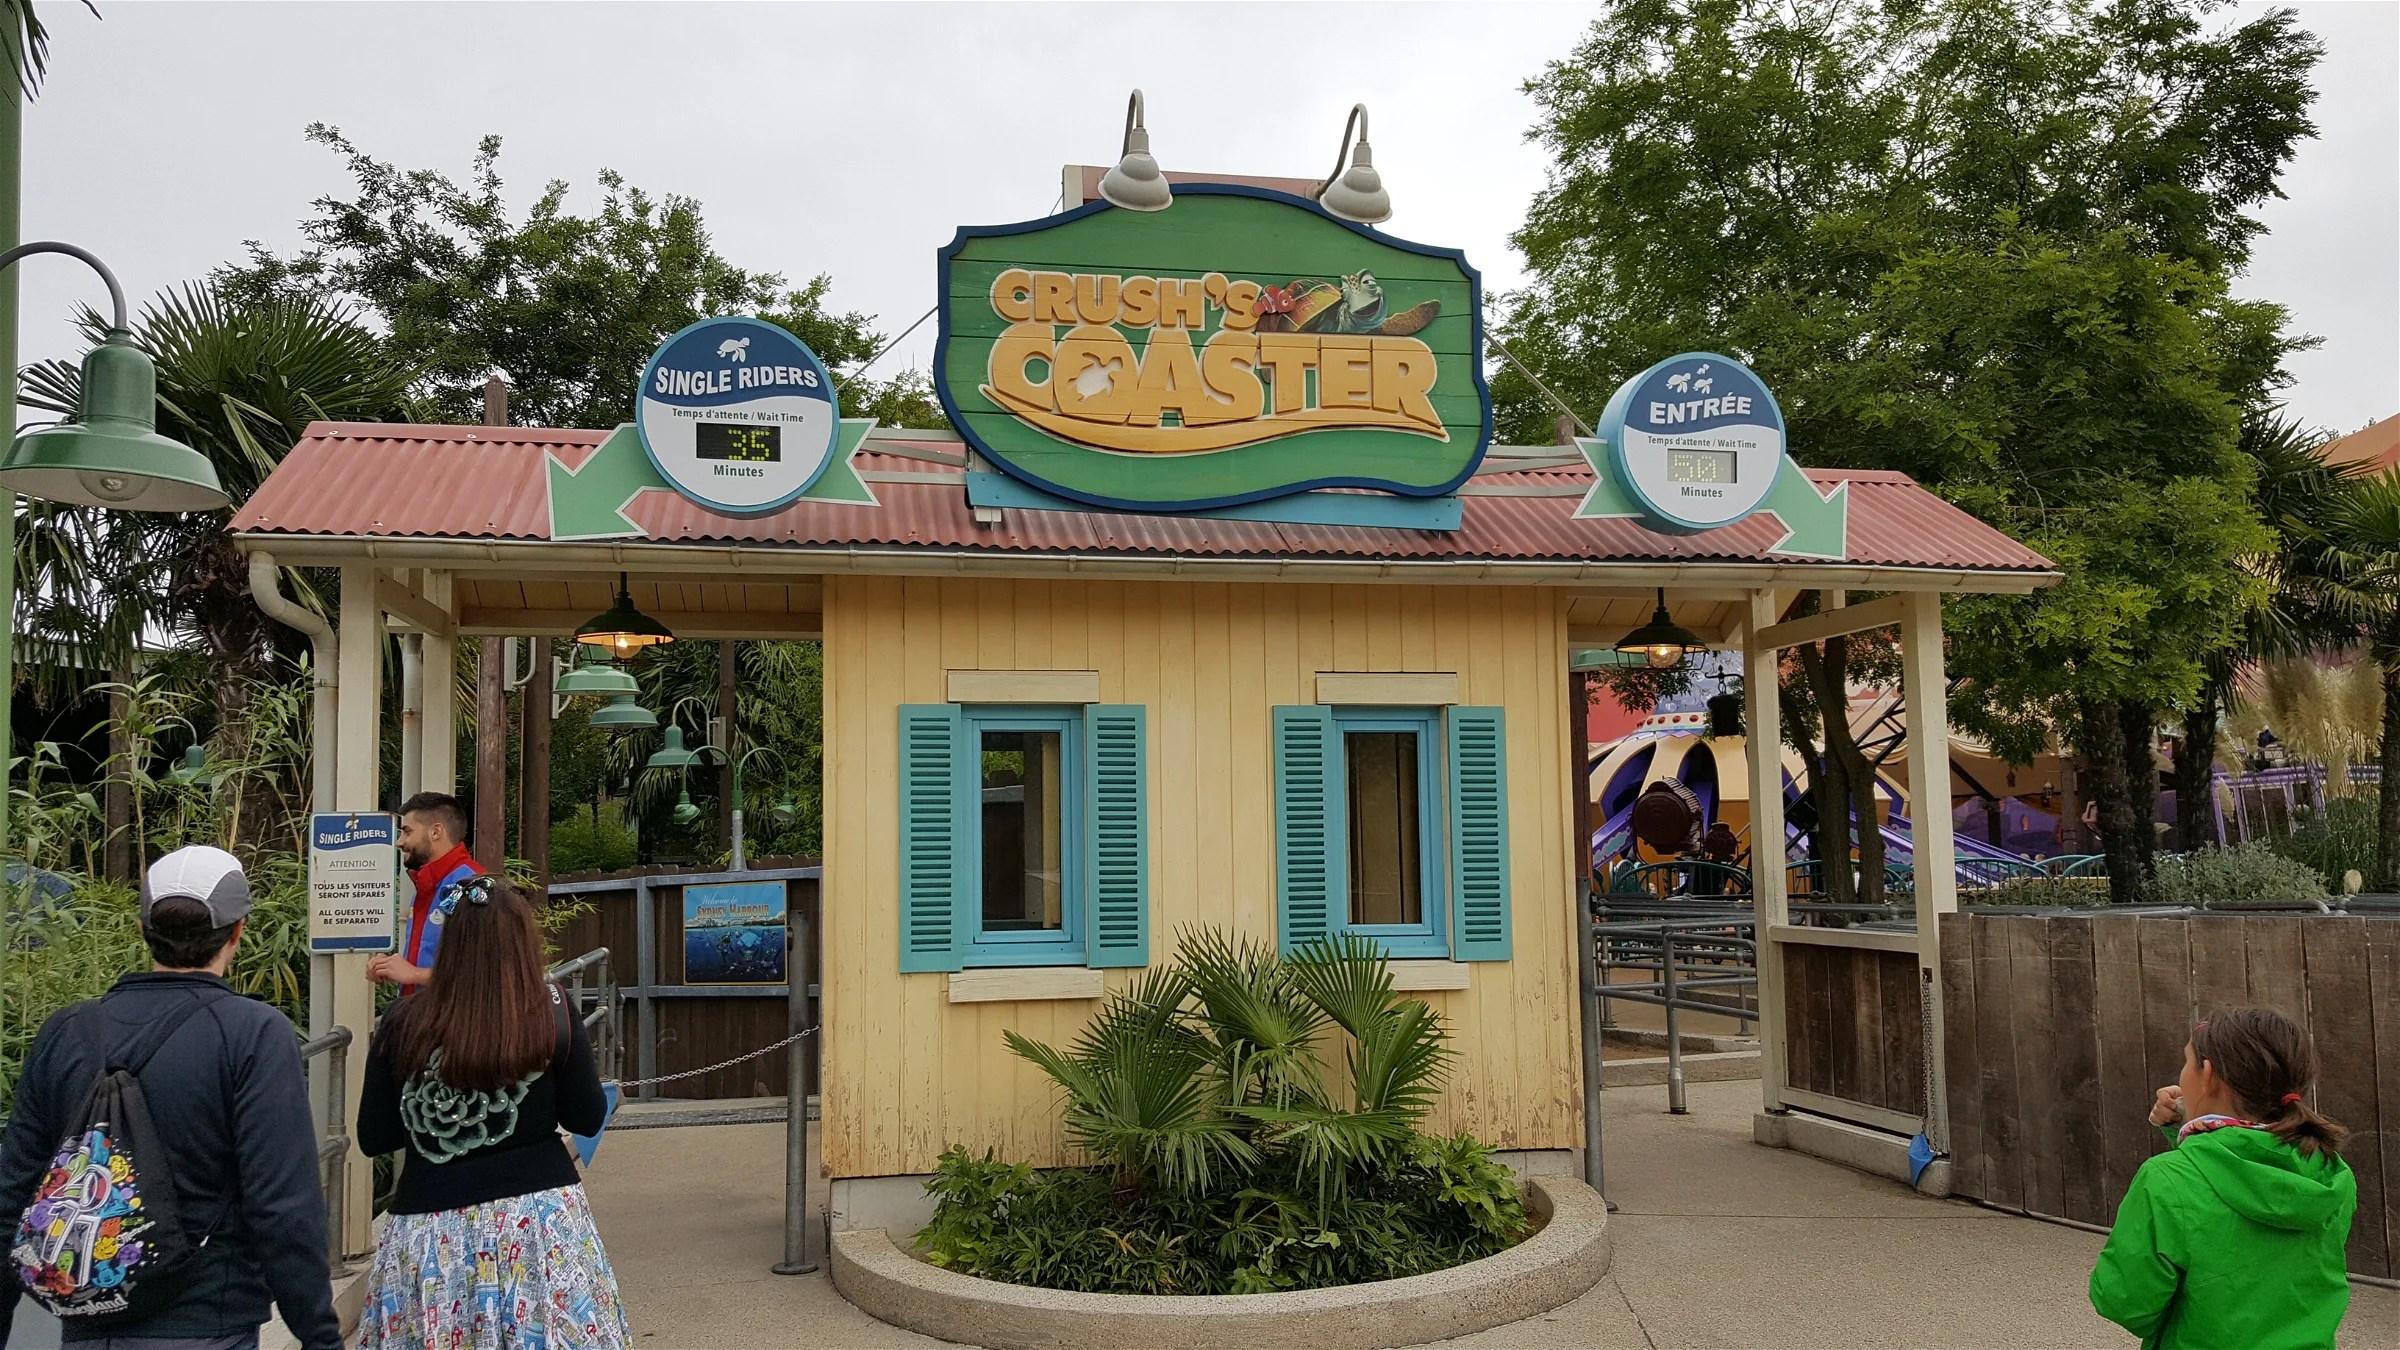 Tipos de filas nos parques de Orlando | Andreza Dica e Indica